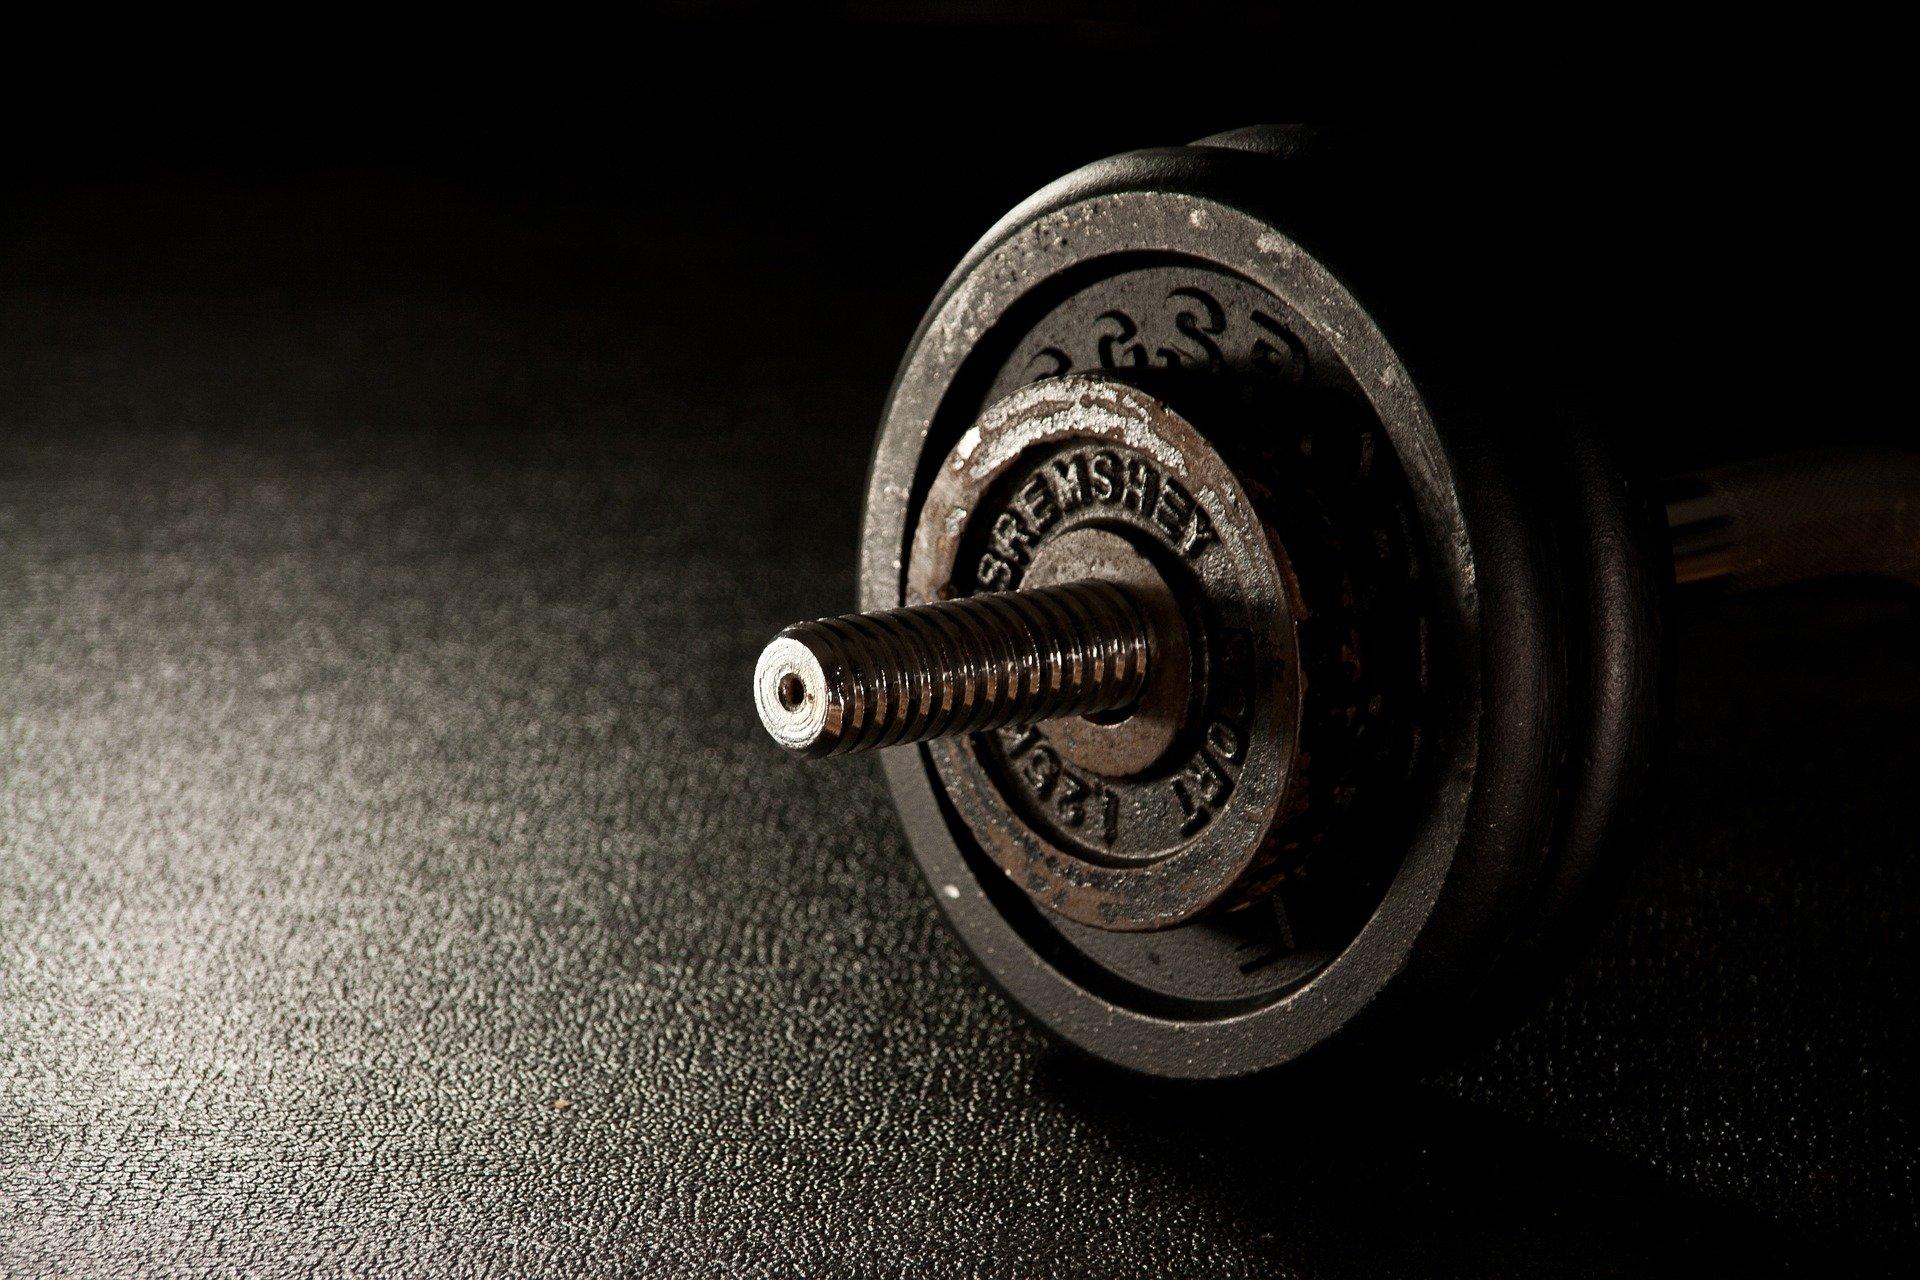 Dr. Krieg & Kollegen EMS-/Fitnessstudios Inkasso Rechtsberatung Hantel Gewicht